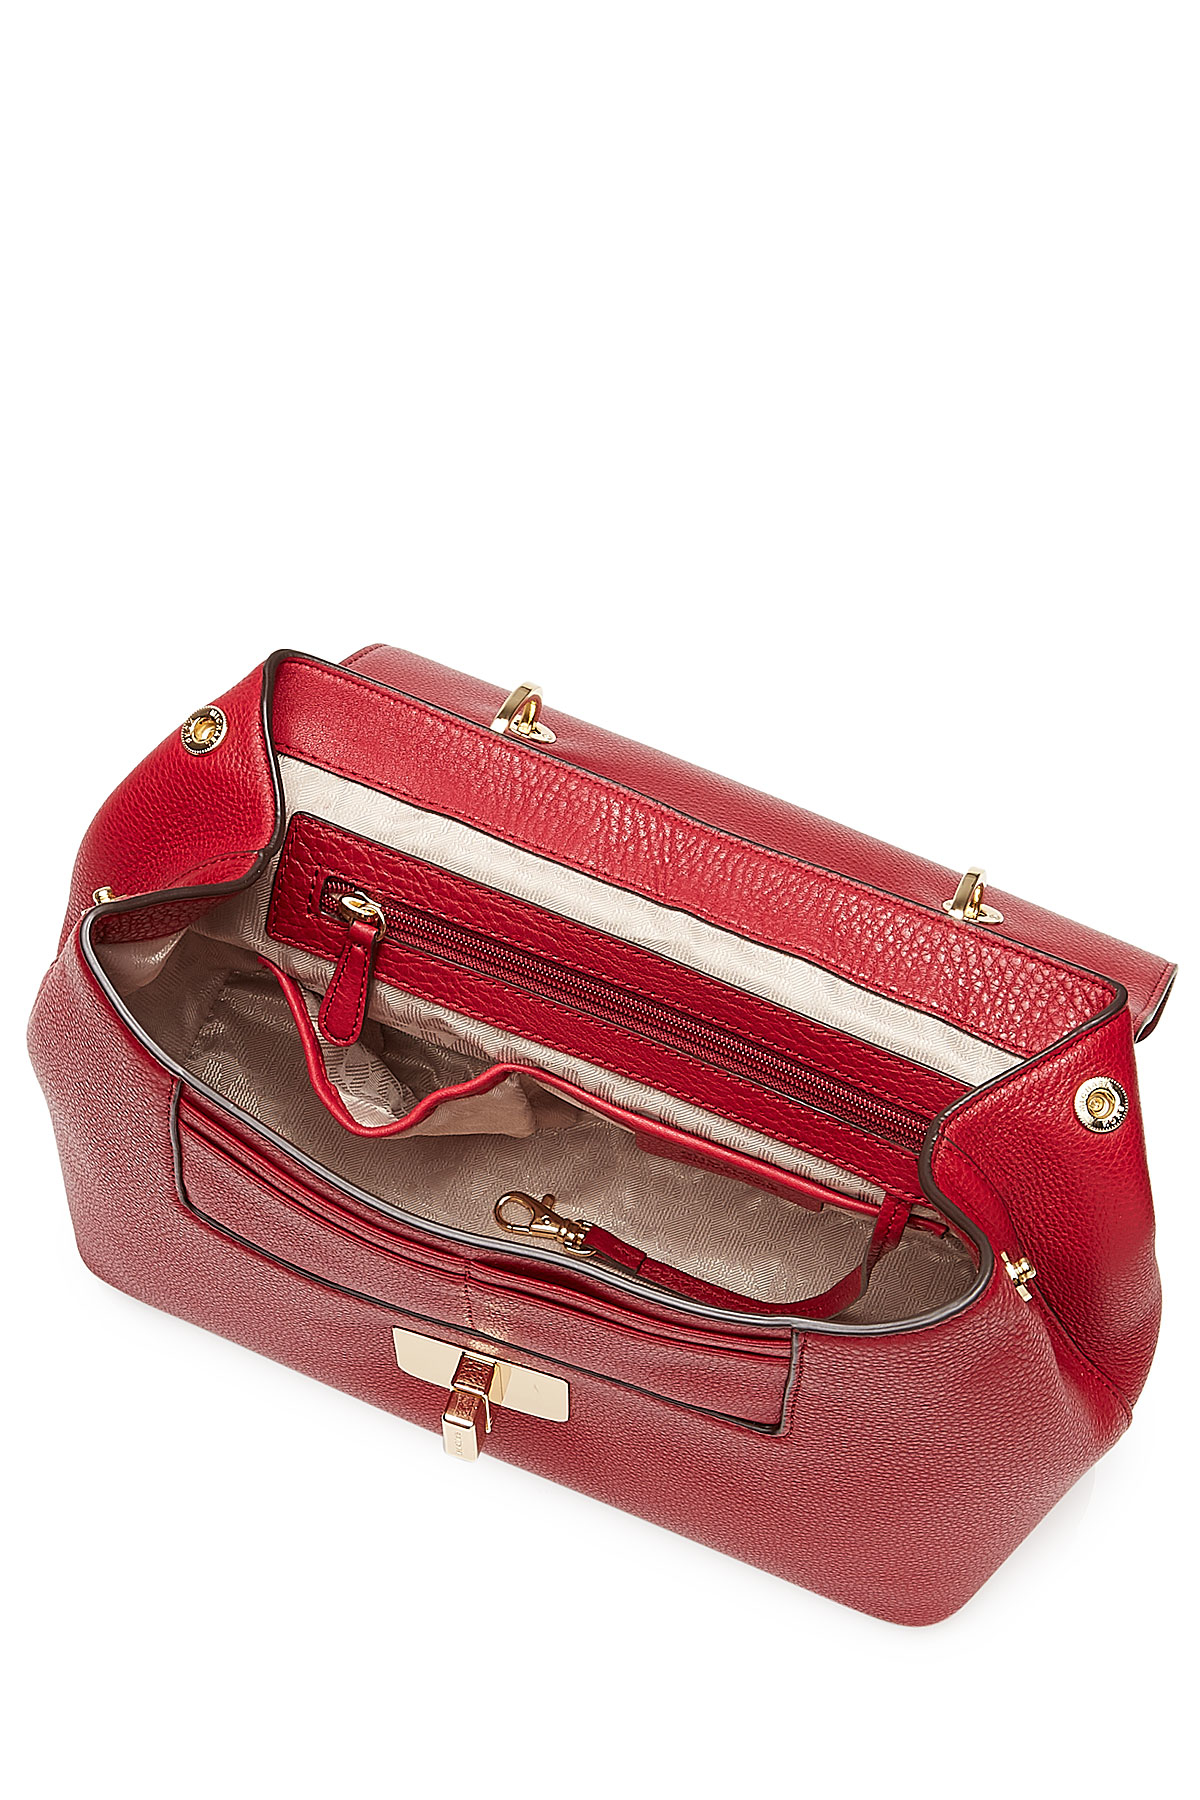 e8840701af0ad3 MICHAEL Michael Kors Emery Medium Leather Shoulder Bag - Red in Red ...